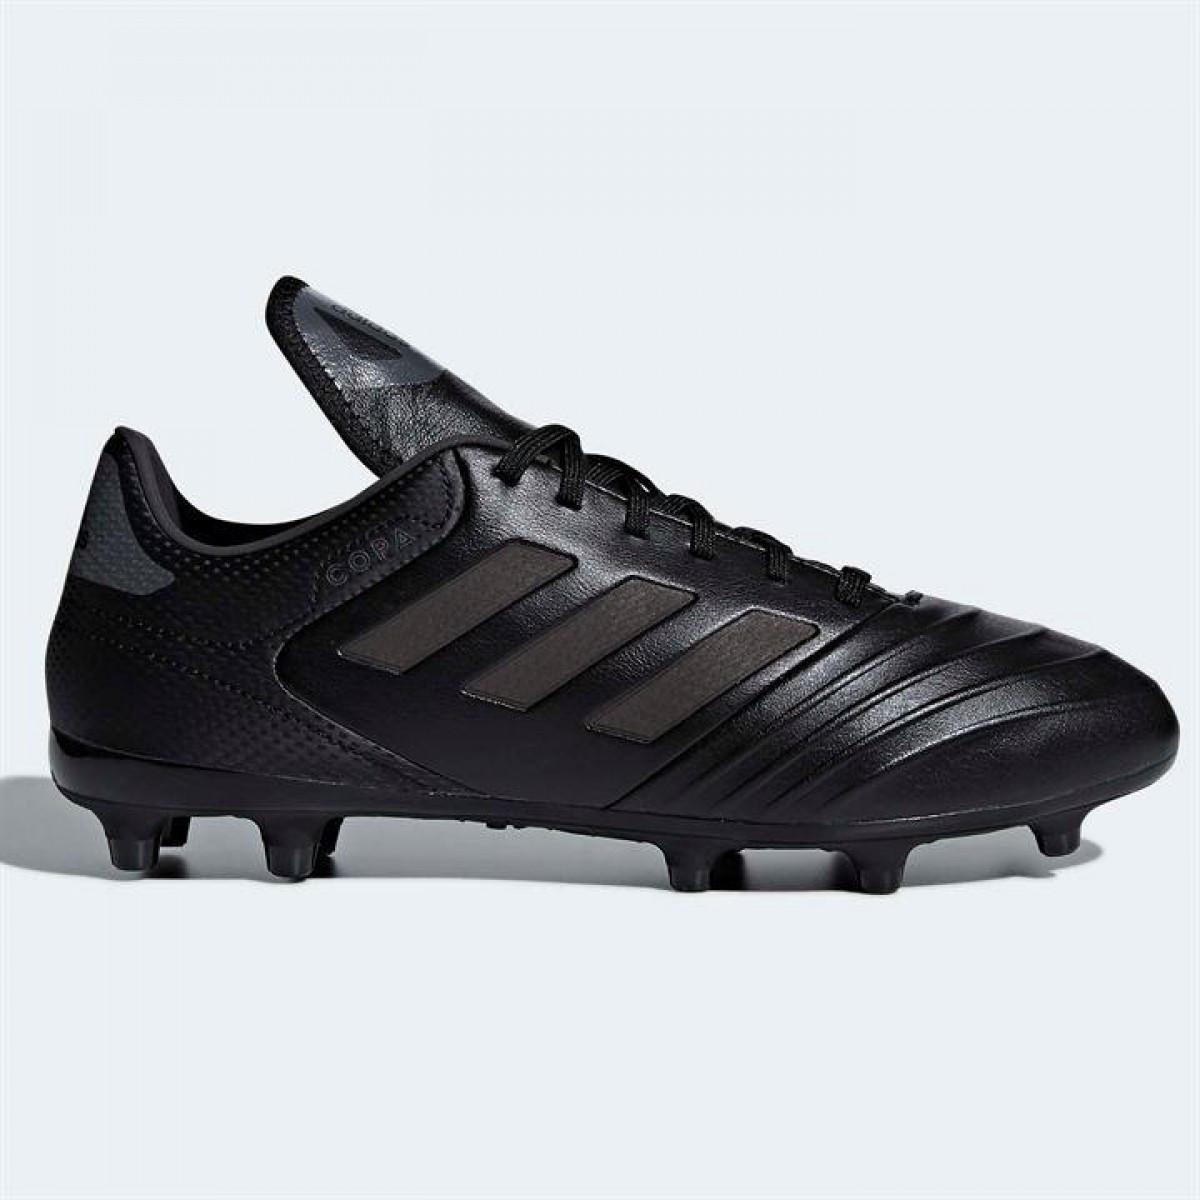 3e05b1fcd5f090 Бутсы adidas Copa 18.3 FG Black/Black - Оригинал - FAIR - оригинальная  одежда и